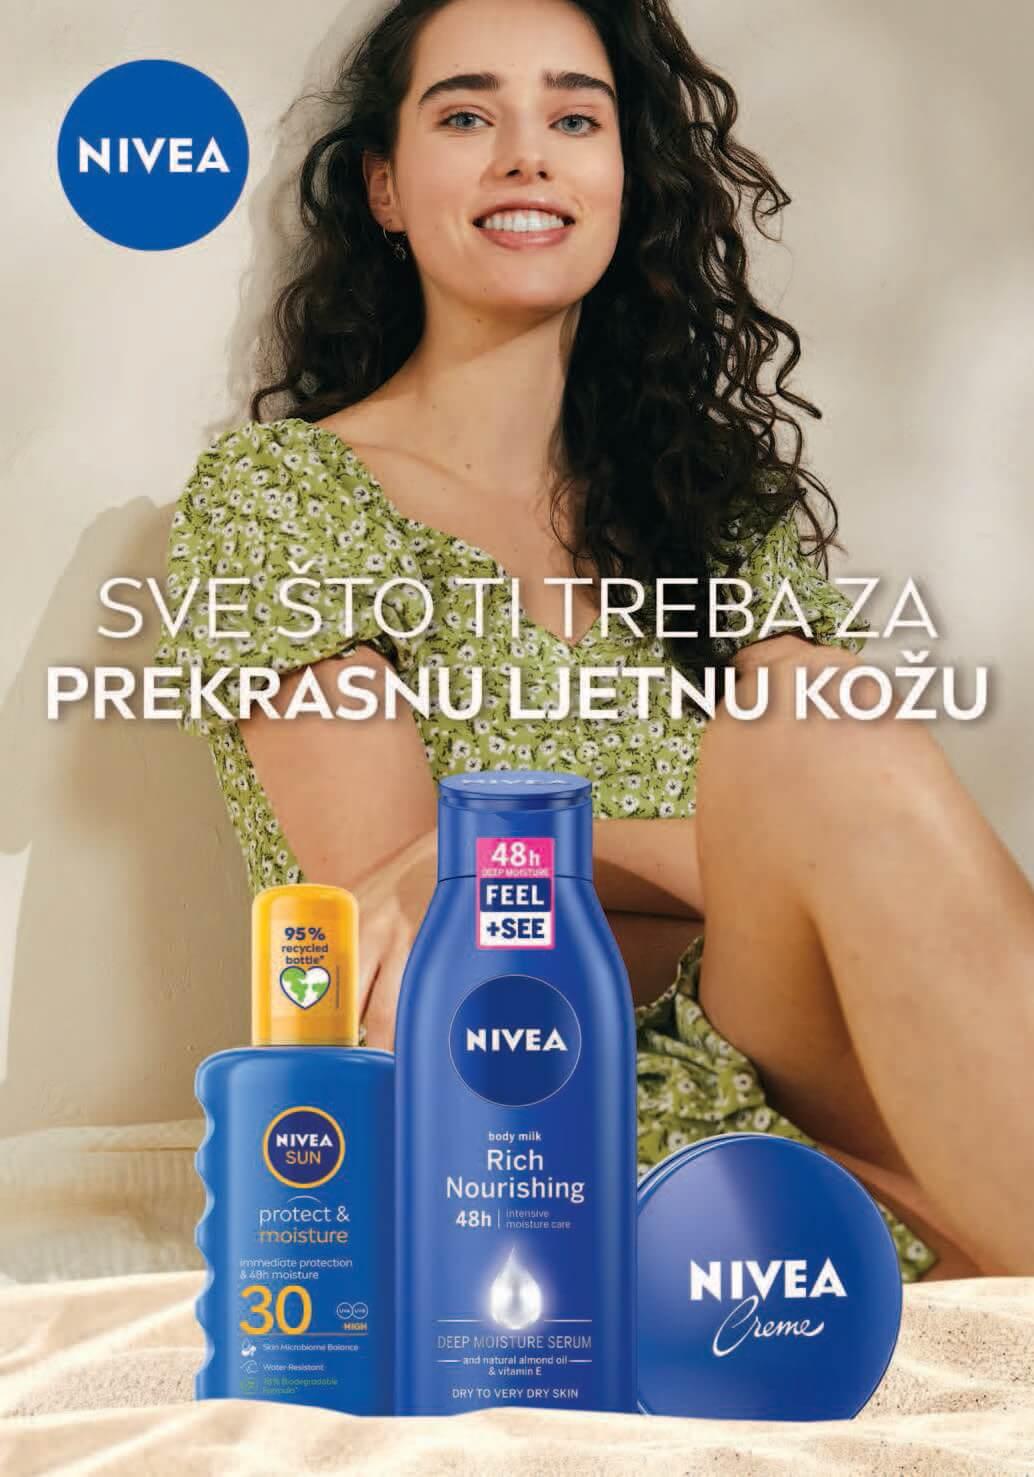 DM Katalog BiH JUN 2021 09.06. 22.06. eKatalozi.com PR Page 06